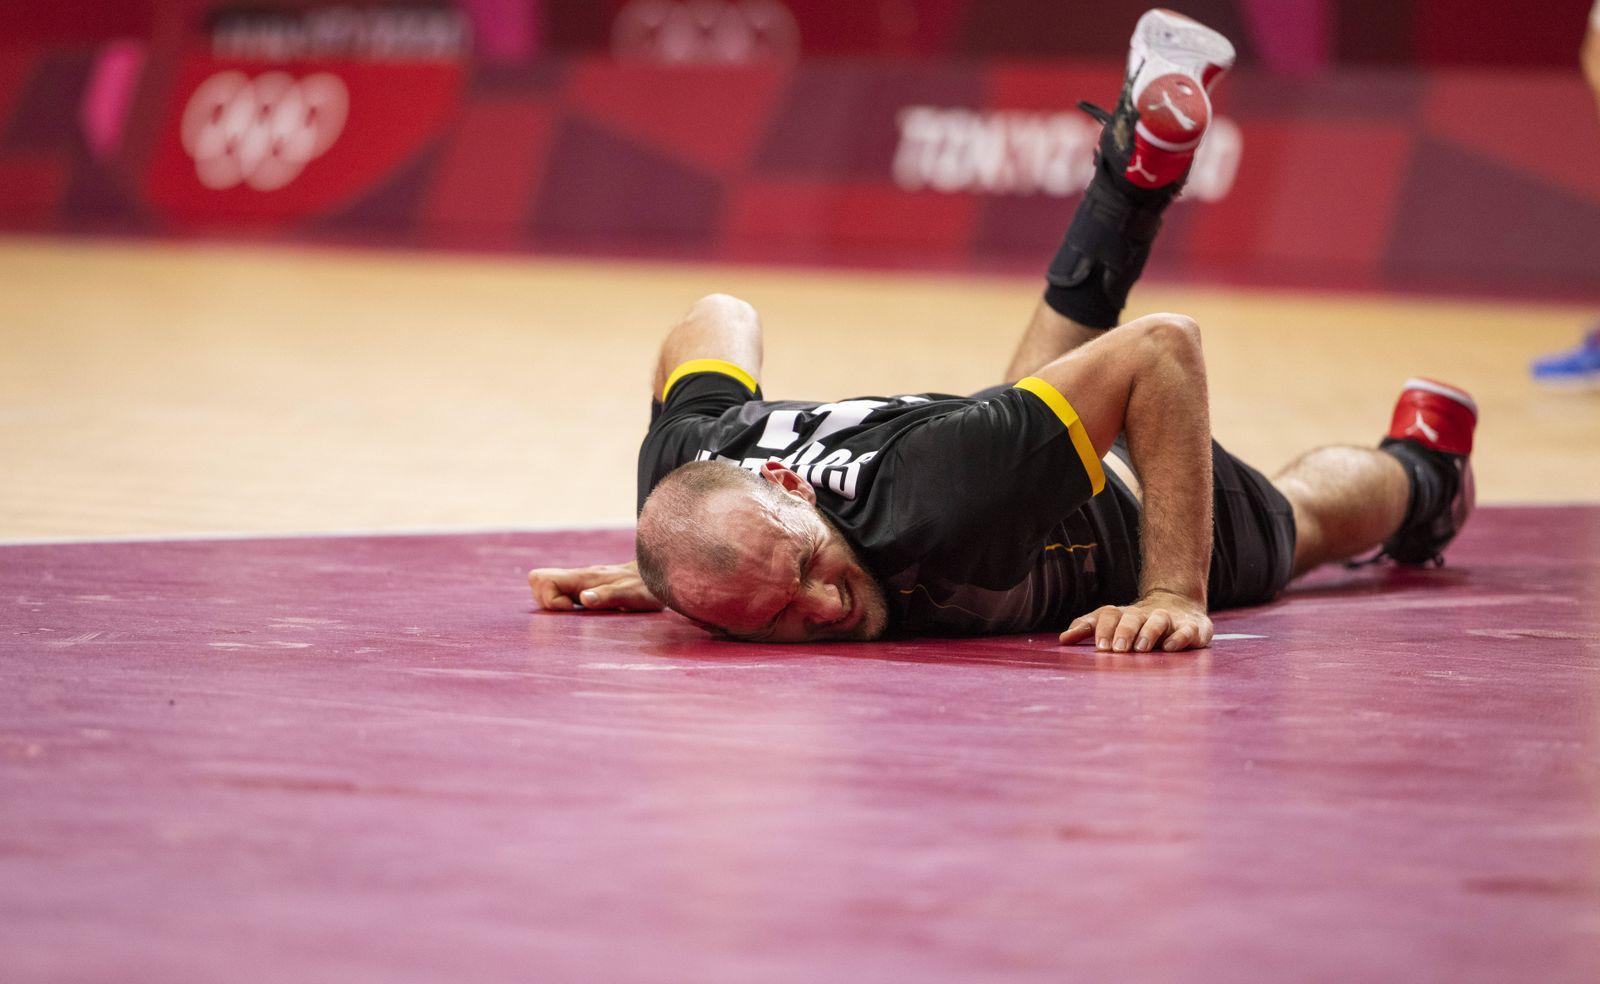 SCHILLER Marcel (GER) Germany - Espana Handball Tokyo Tokio, 24.07.2021, Japan, Olympic Games, Olympische Spiele, Olymp